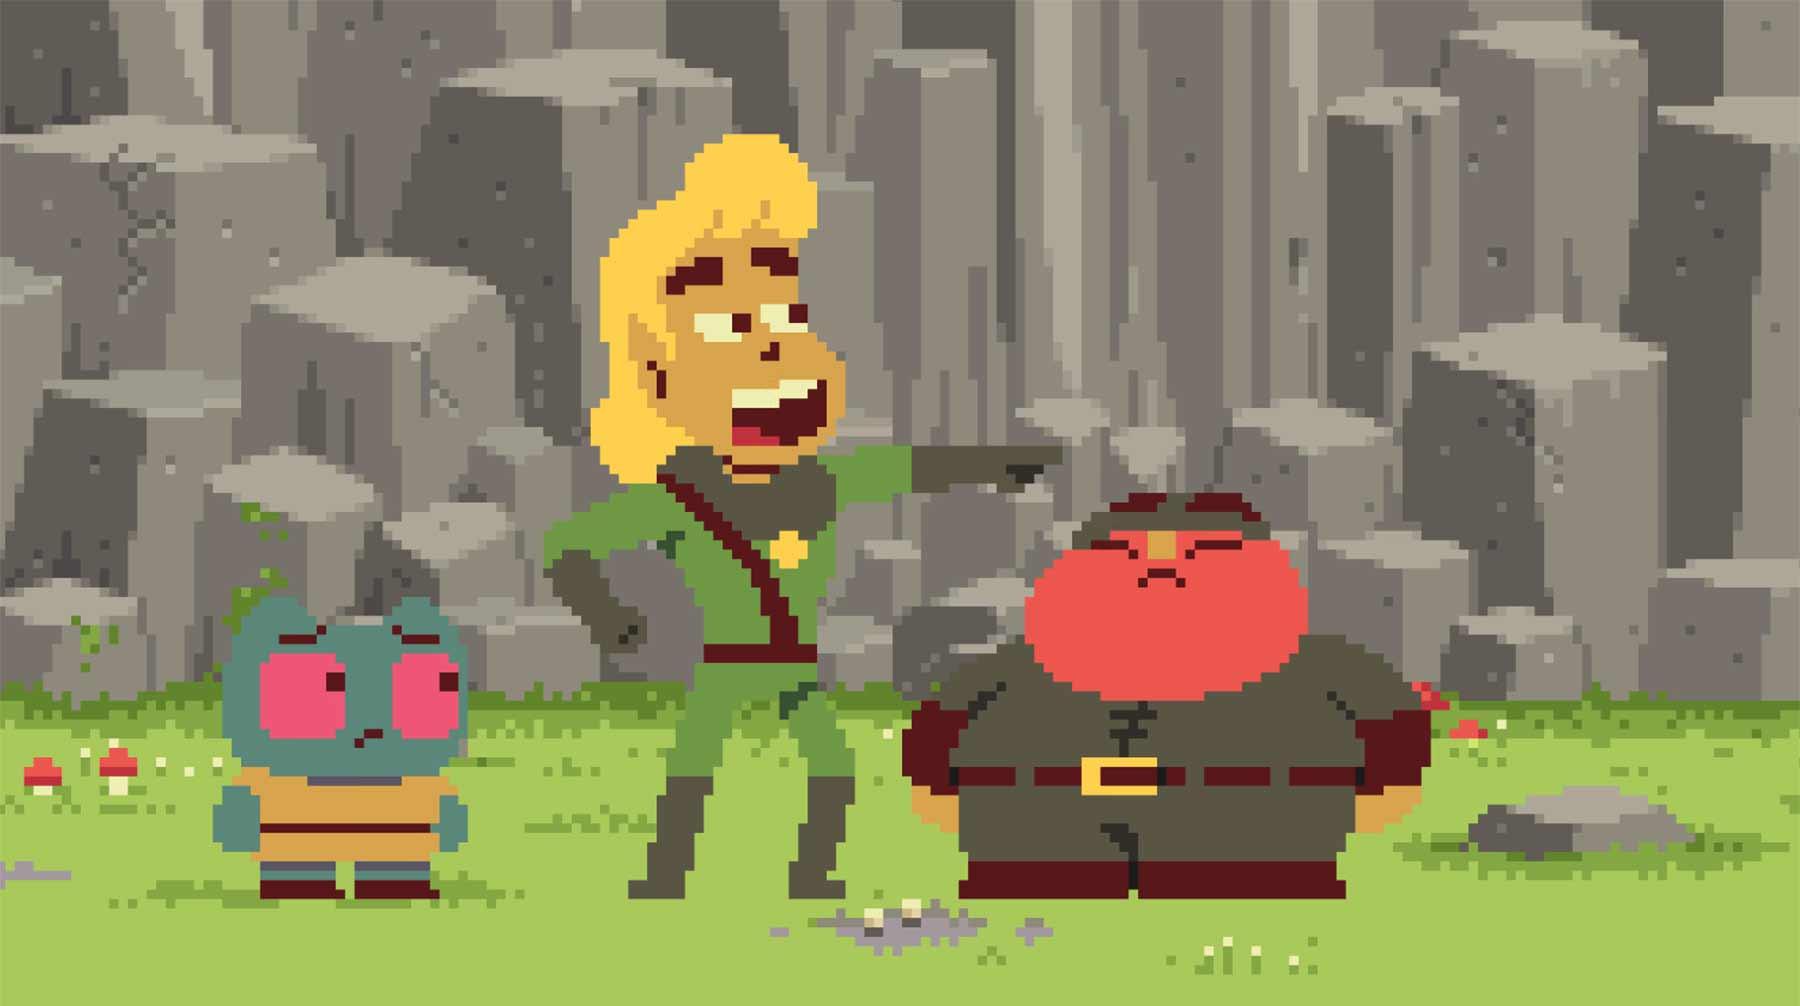 Brutales Pixel-Fantasy-Abenteuer